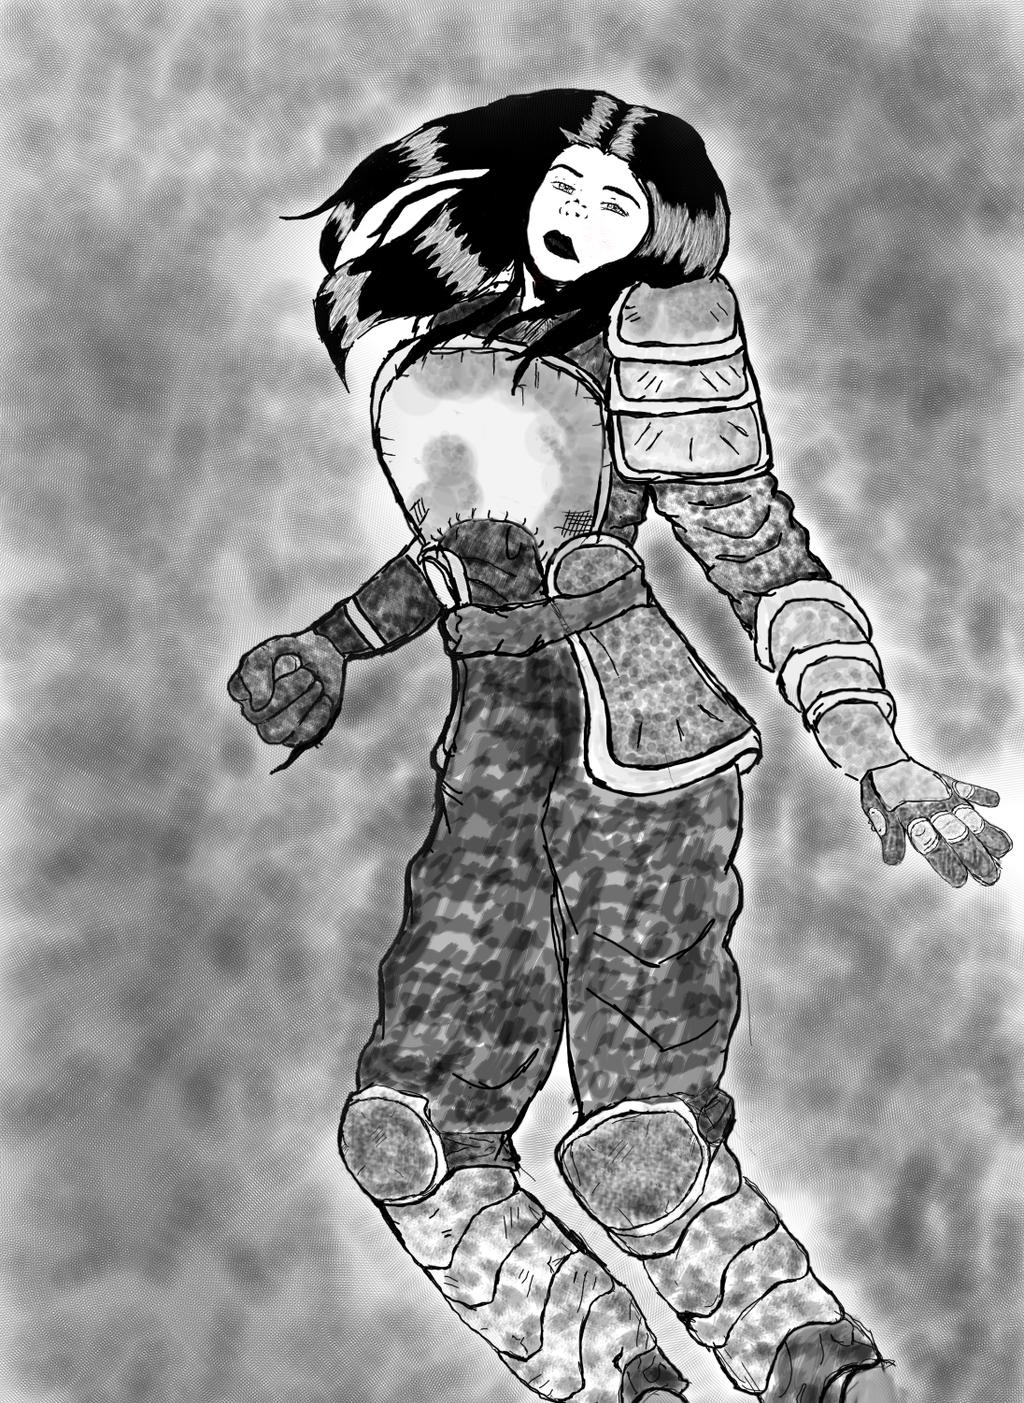 Mulan 1 by Undeadhero1016